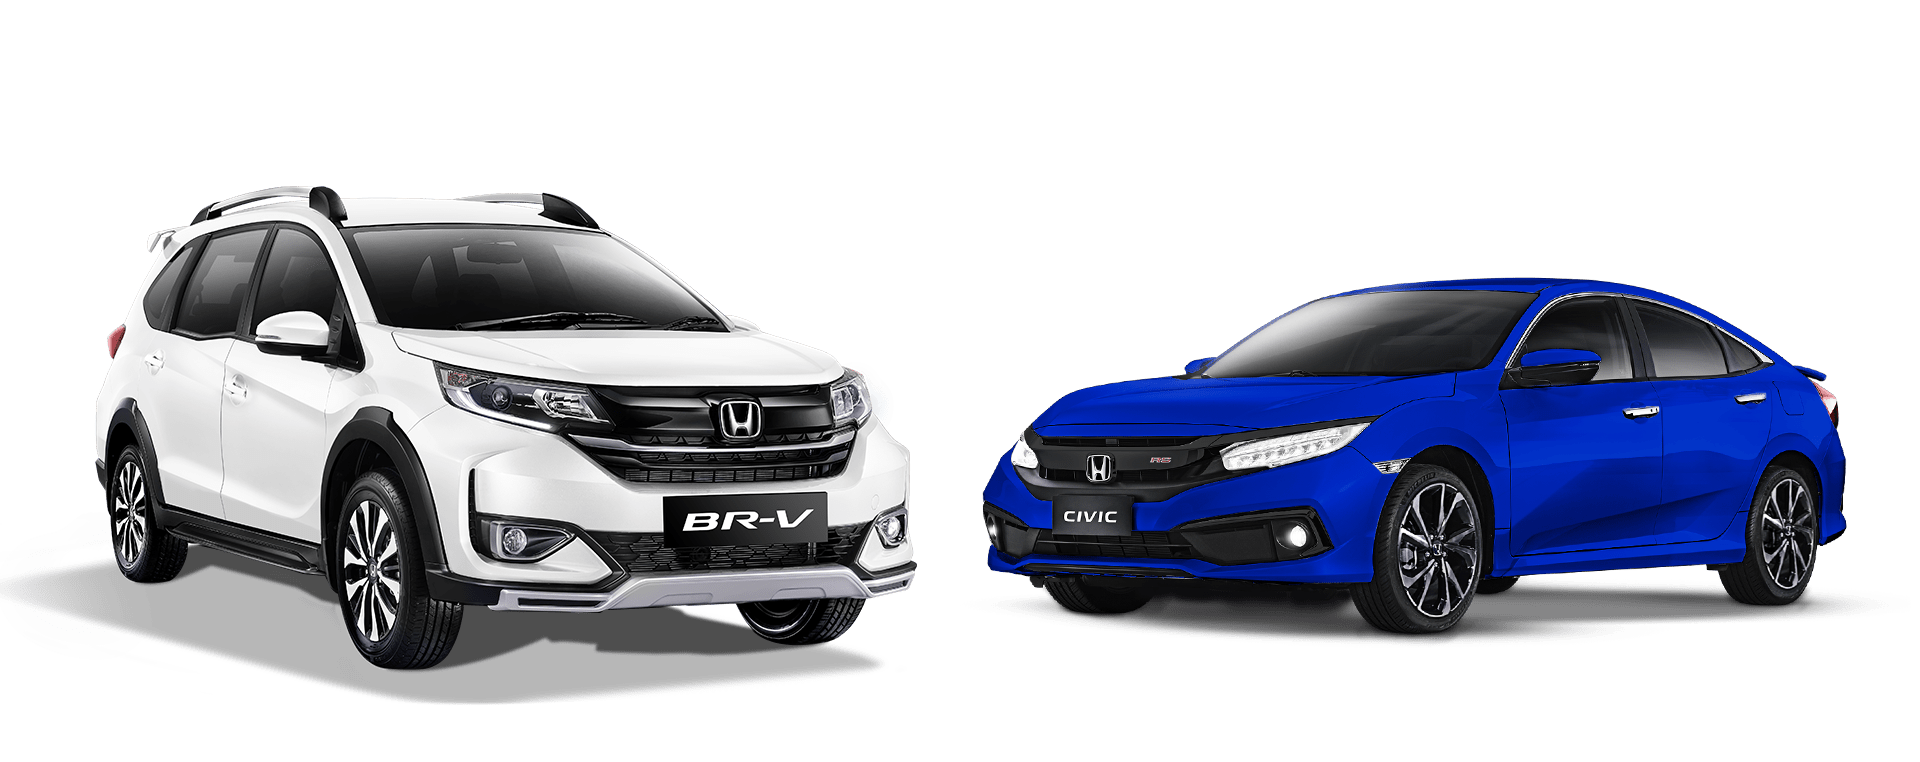 Honda Cars PH Introduces BR-V, Civic Limited Edition Variants